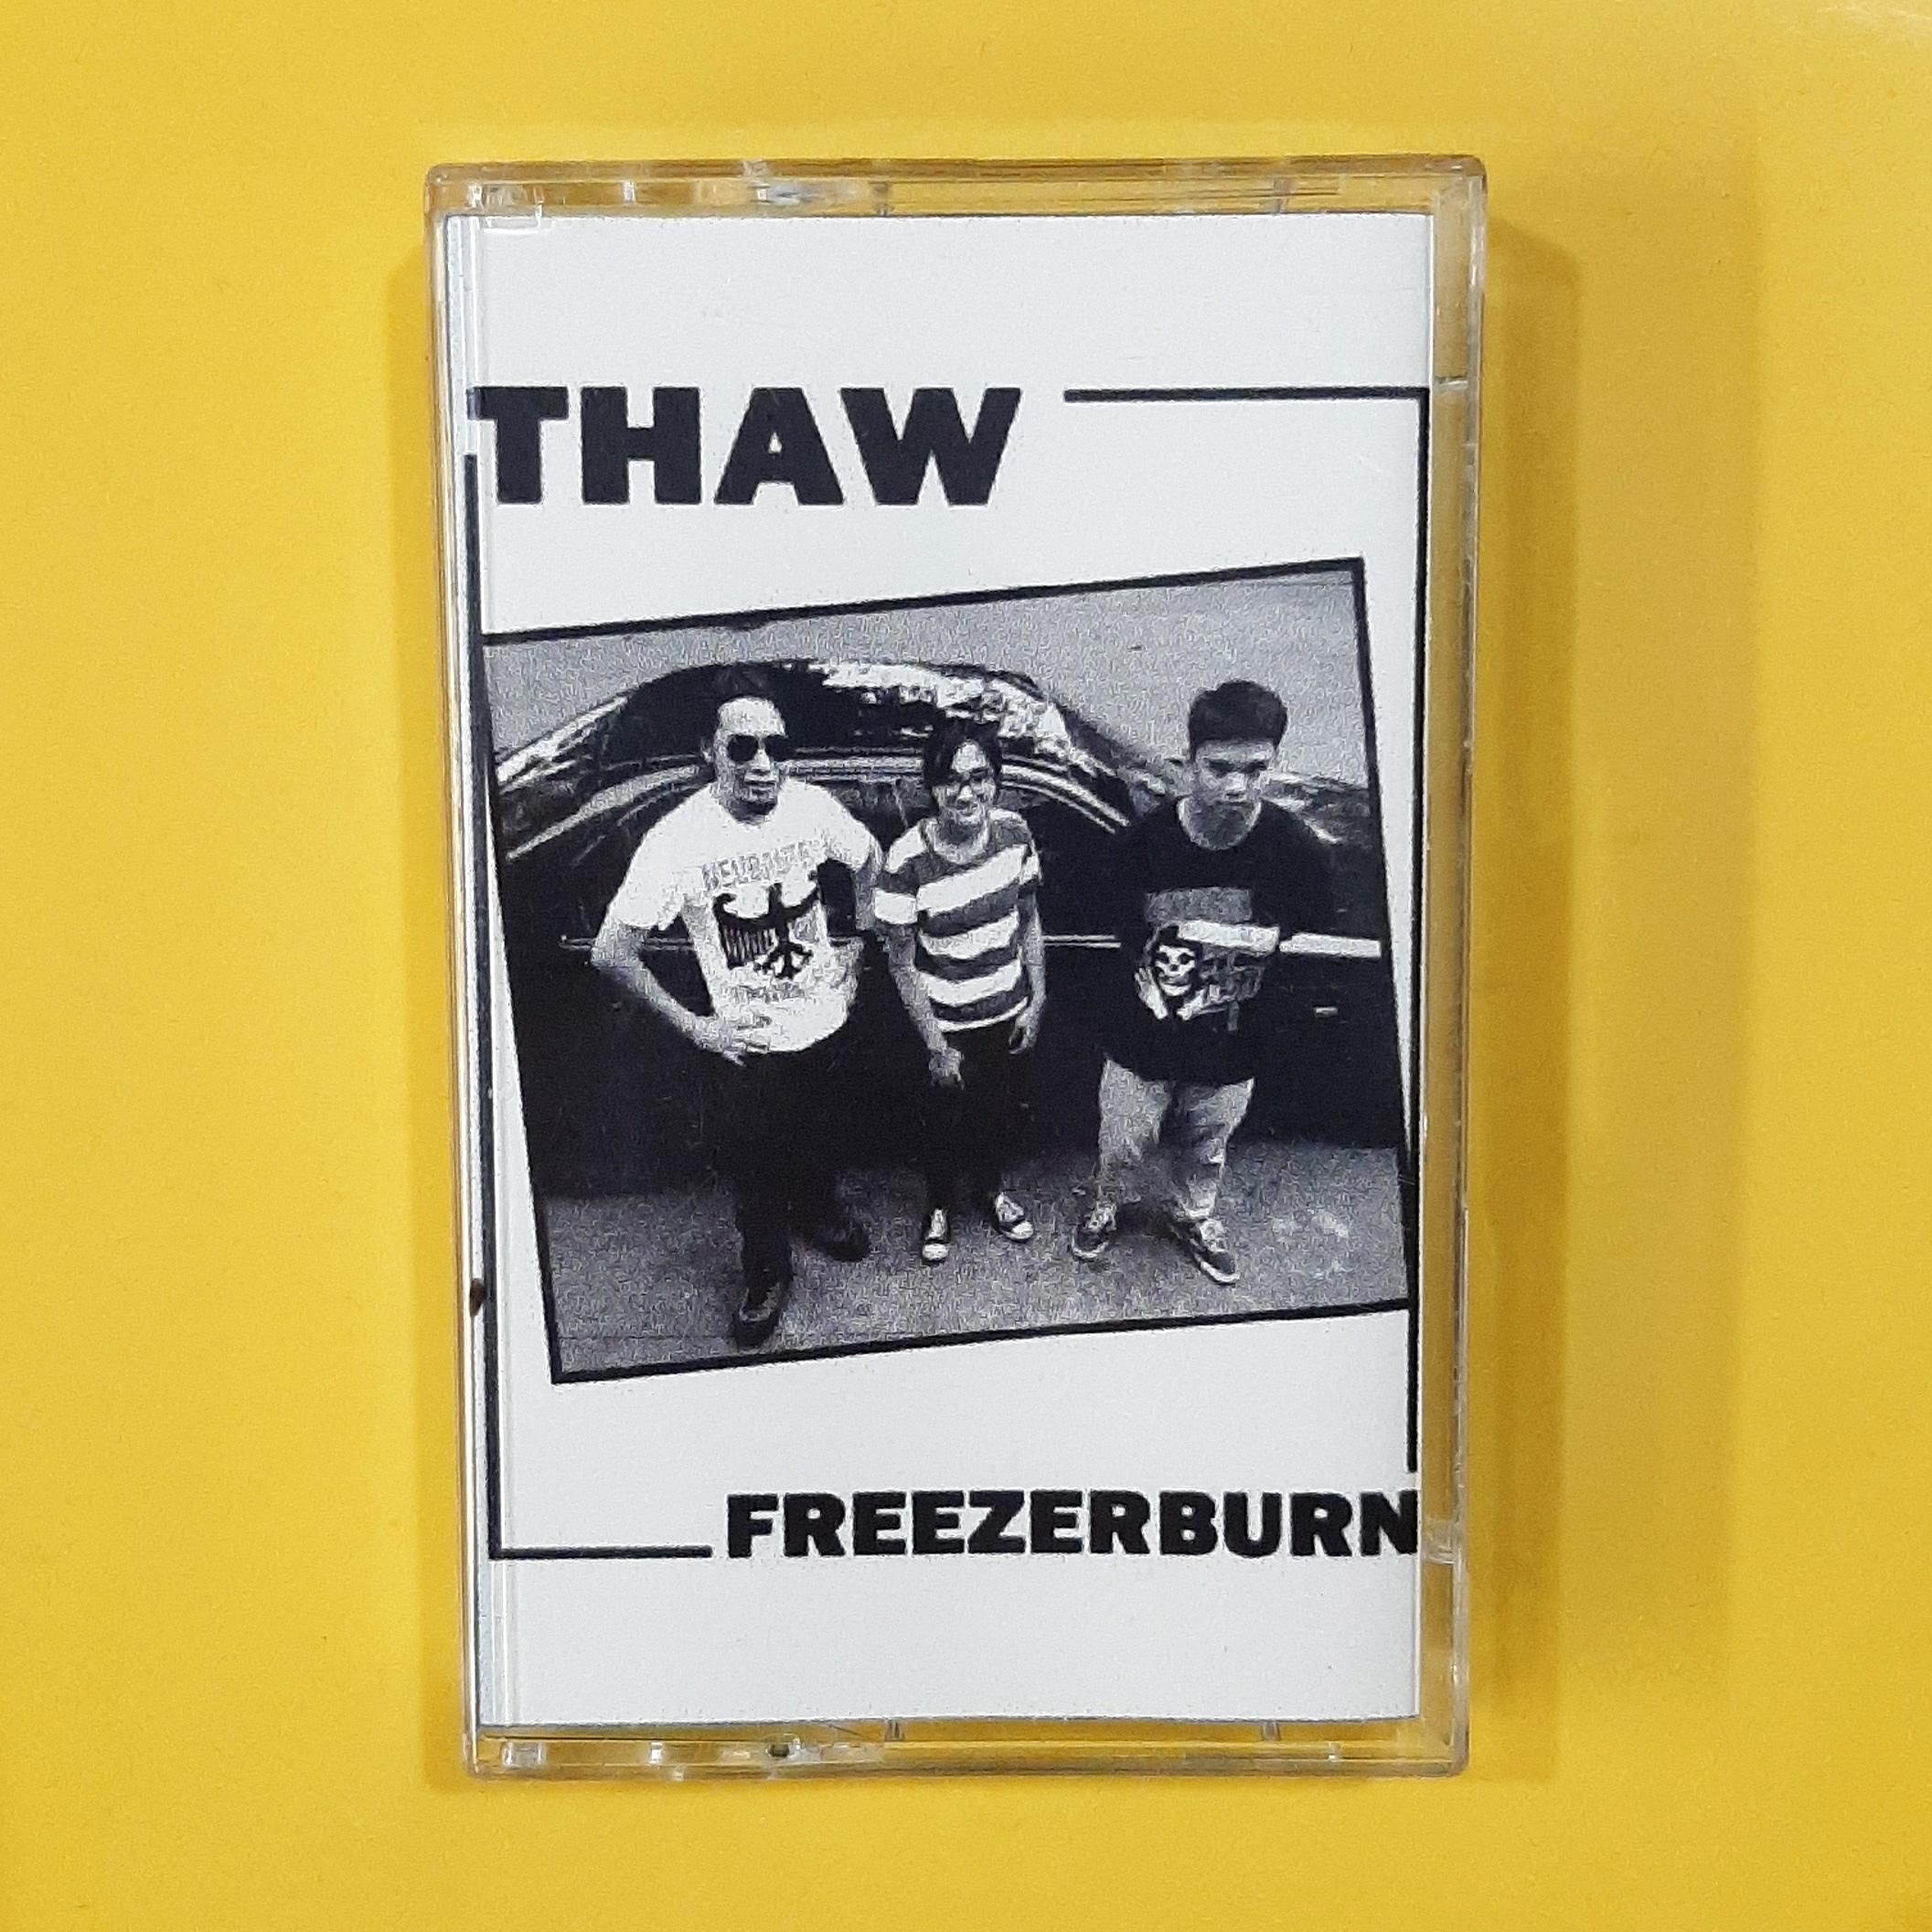 THAW - Freezerburn (Self-Released)